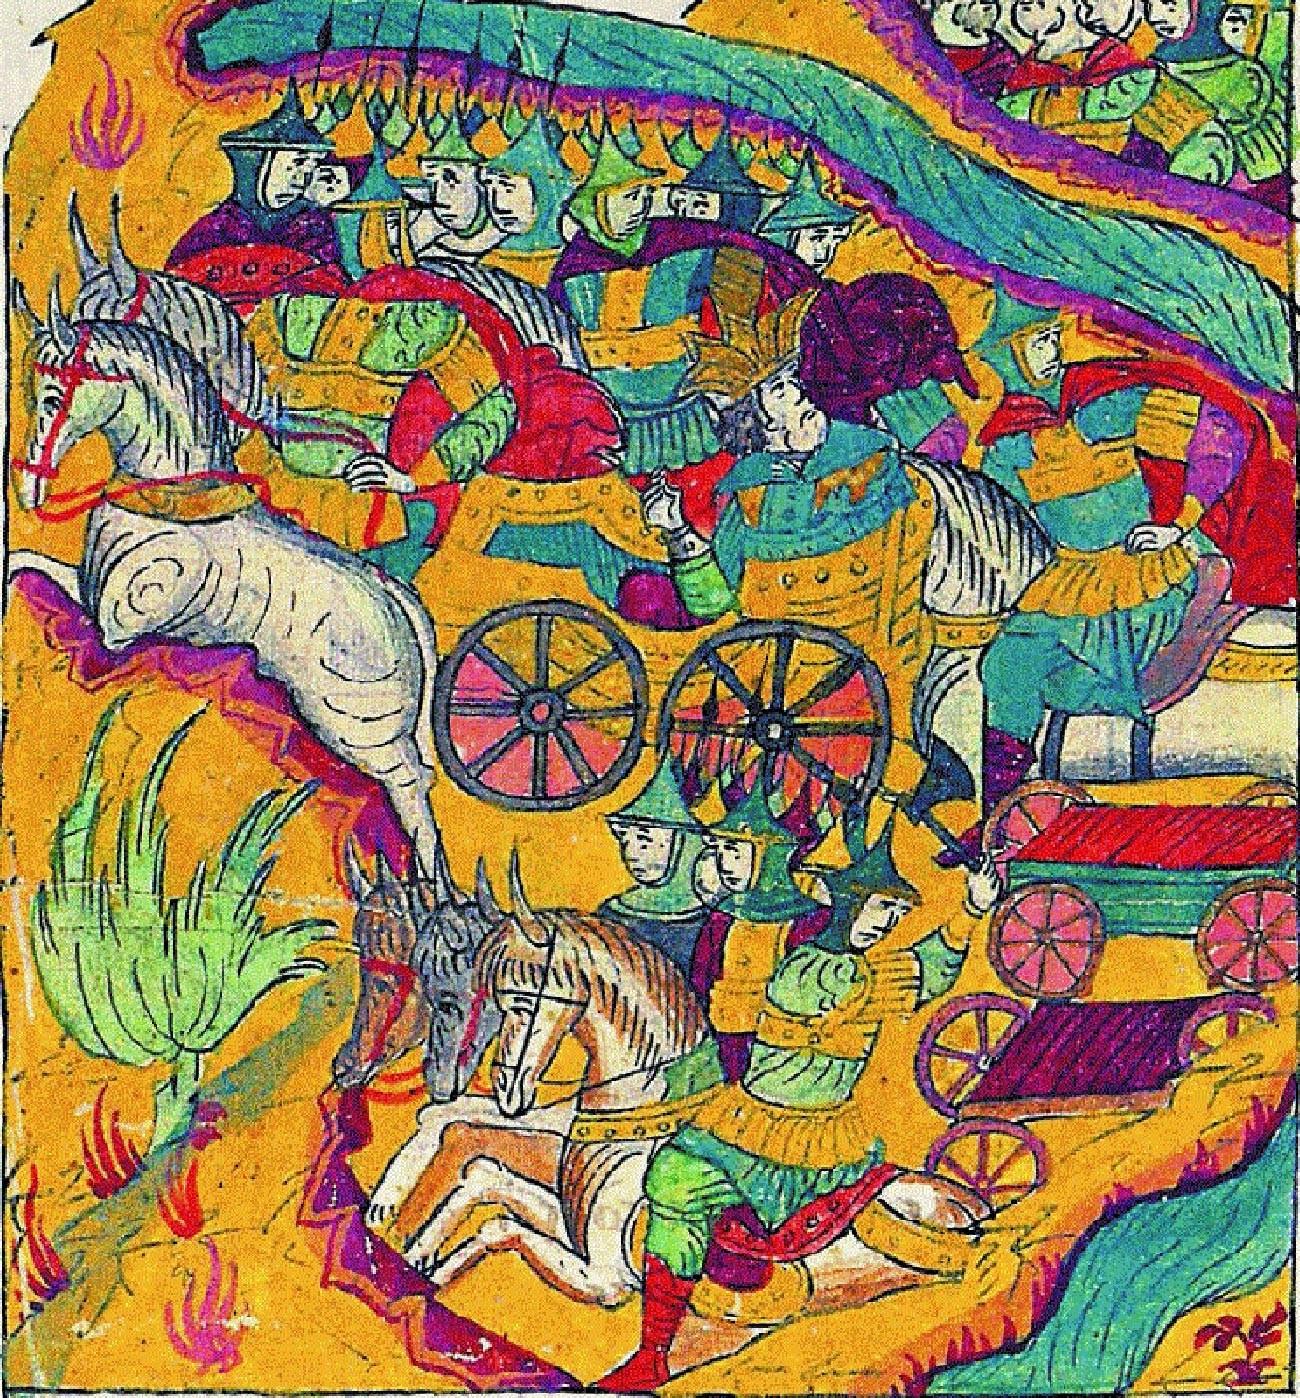 «Бегство Сахиб Гирея с ордой от Оки. 1541 год».